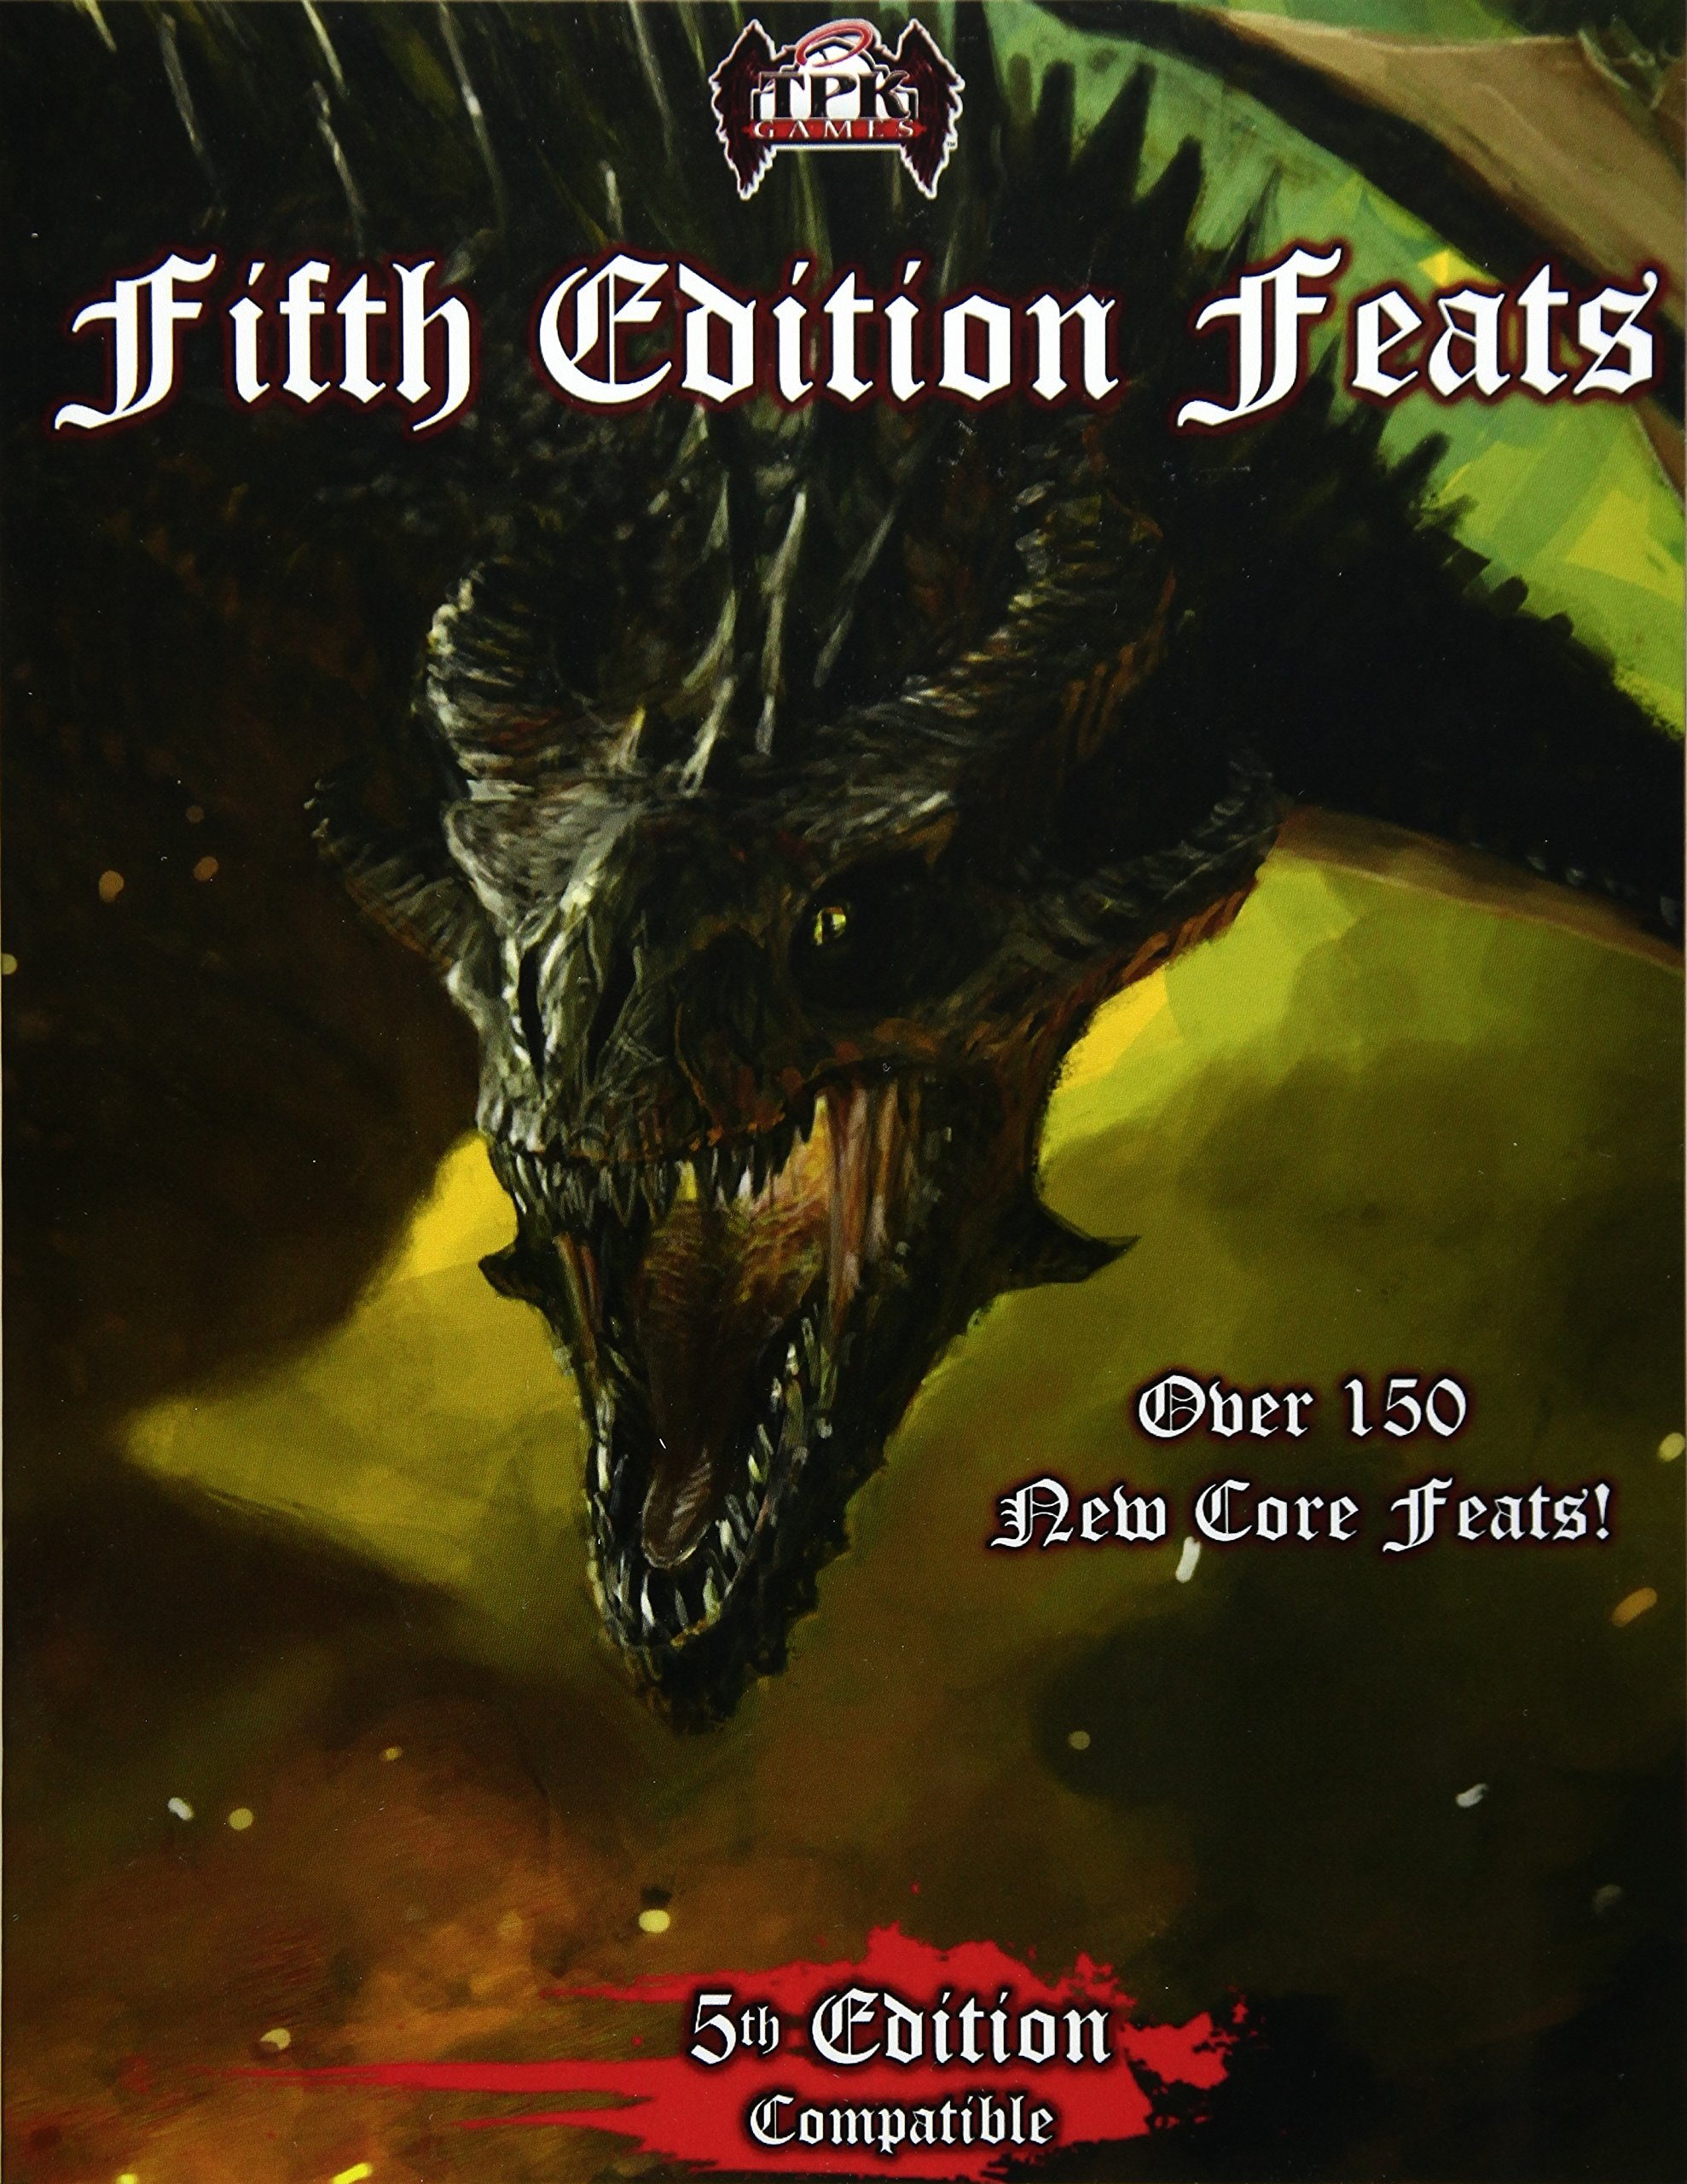 Fifth Edition Feats: Amazon co uk: Brian Berg: 9781530162437: Books